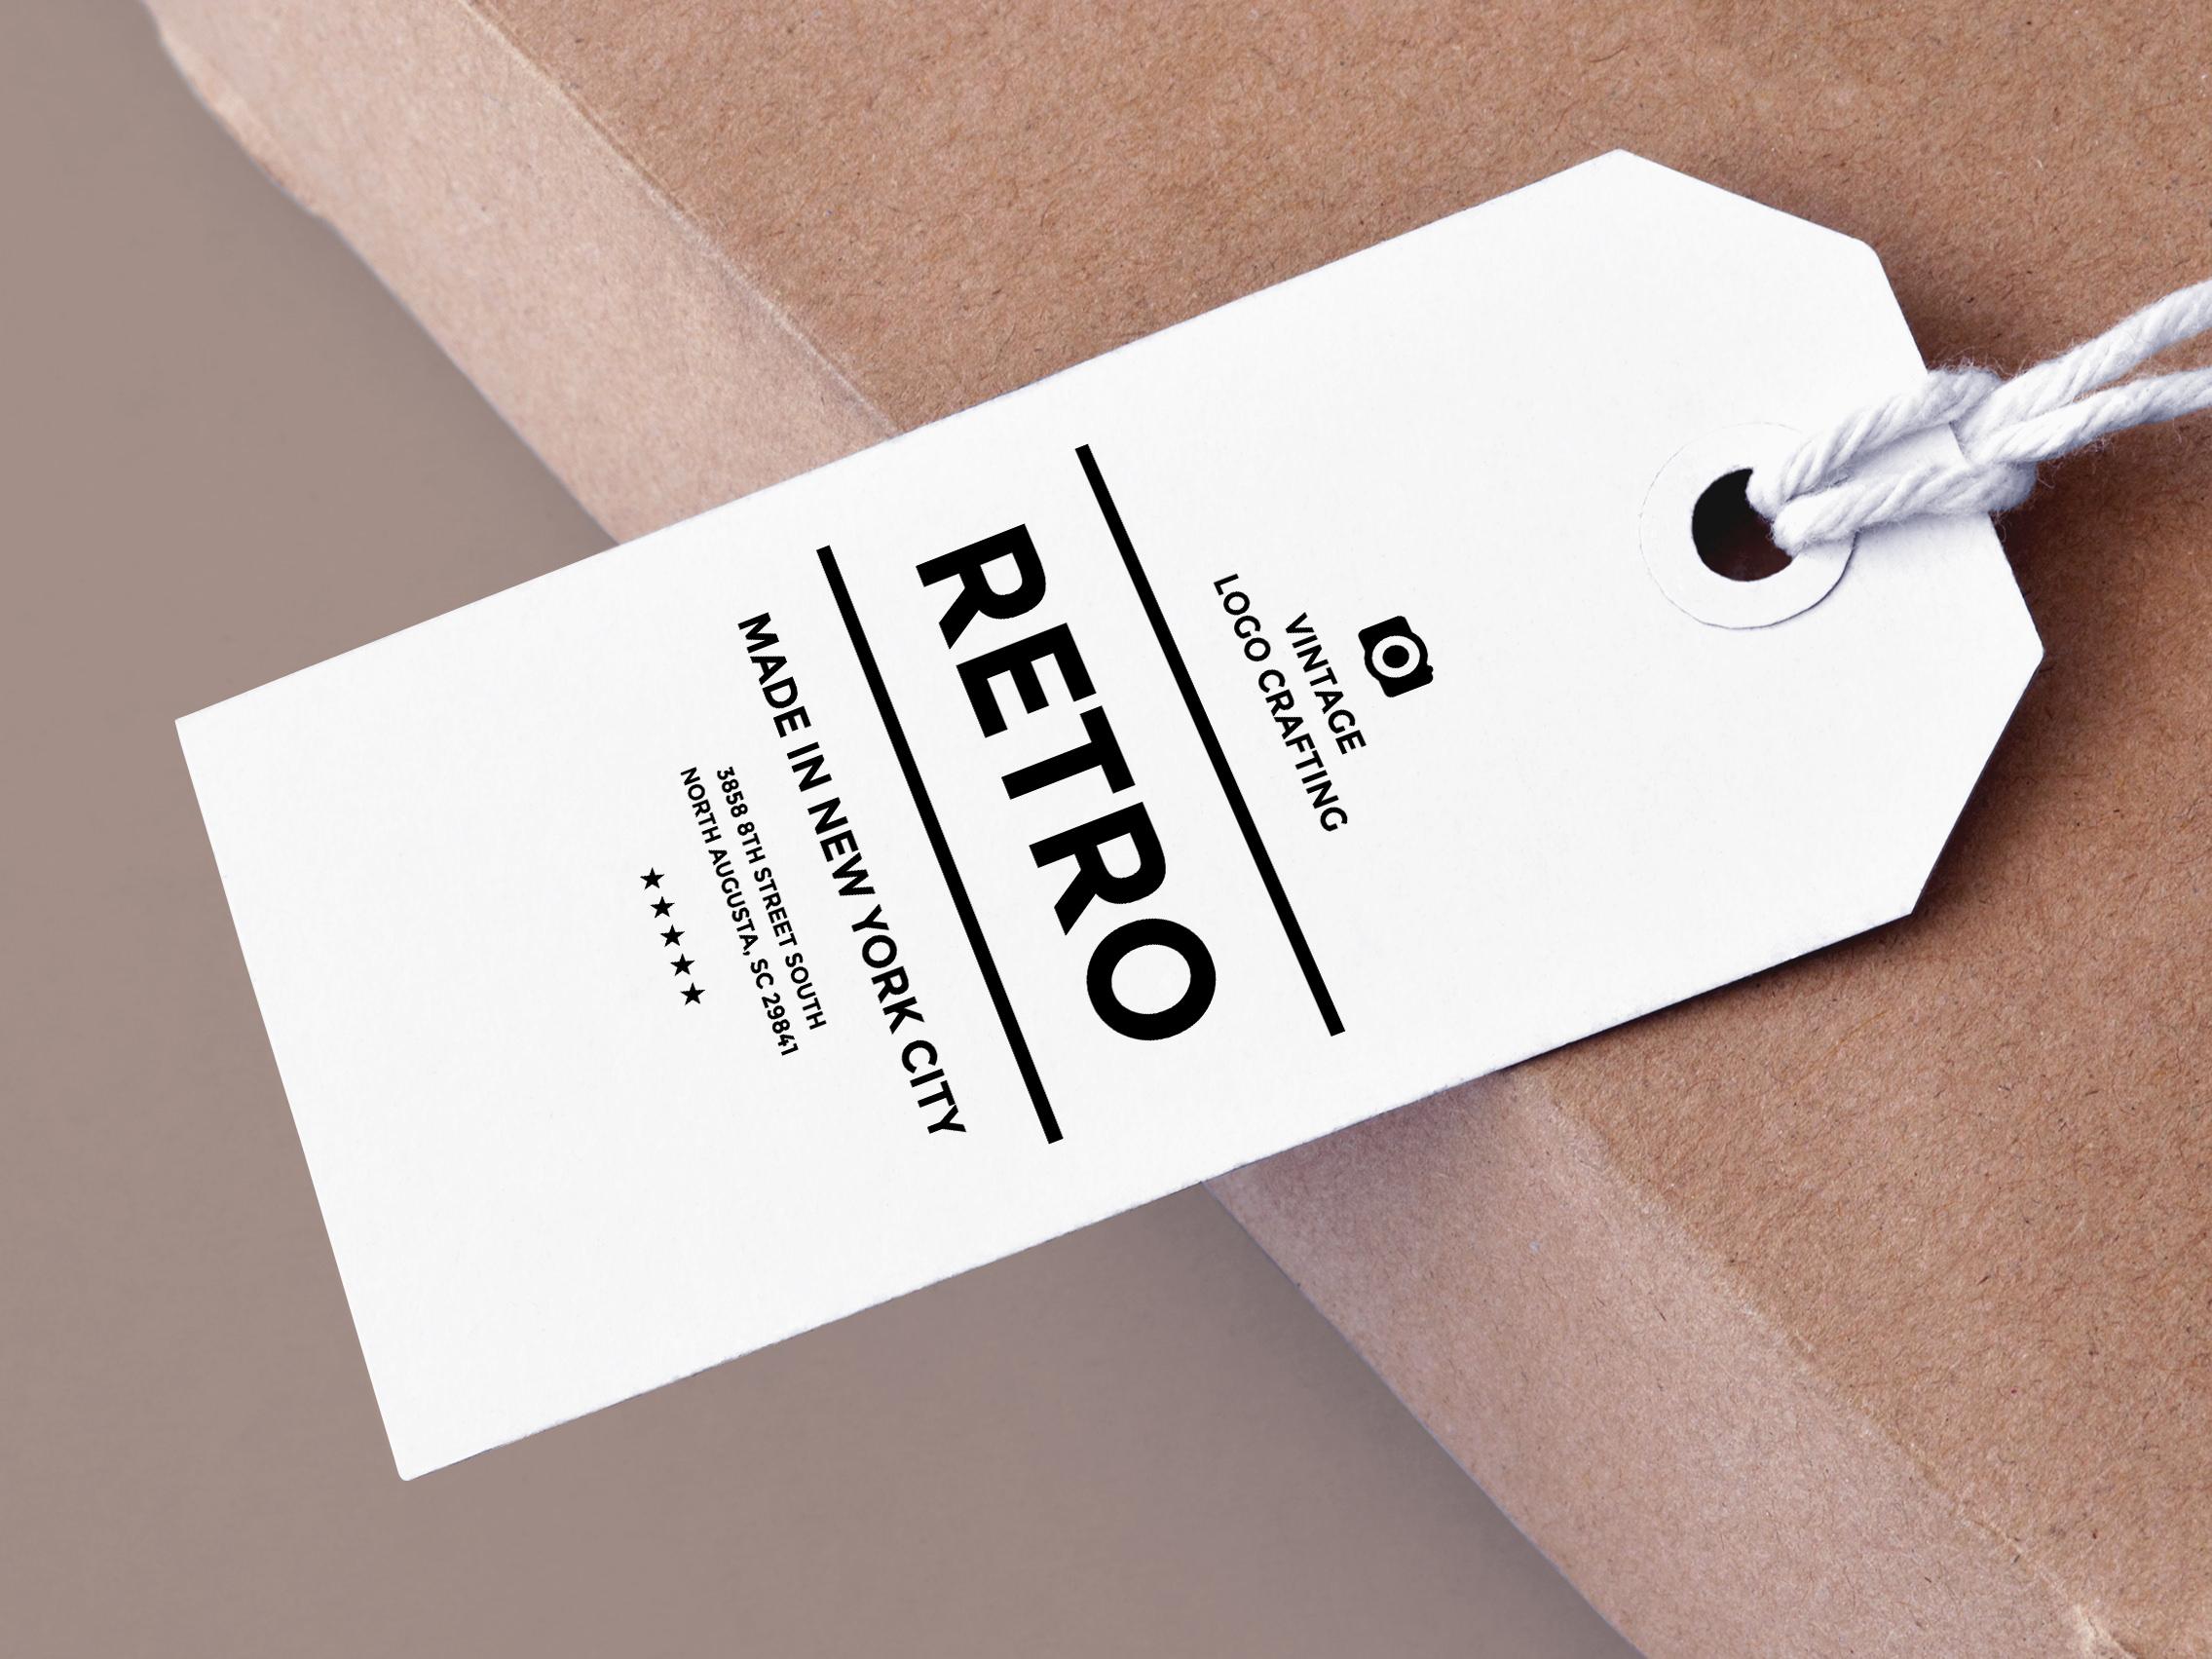 Free-Cardboard-Tag-Mockup